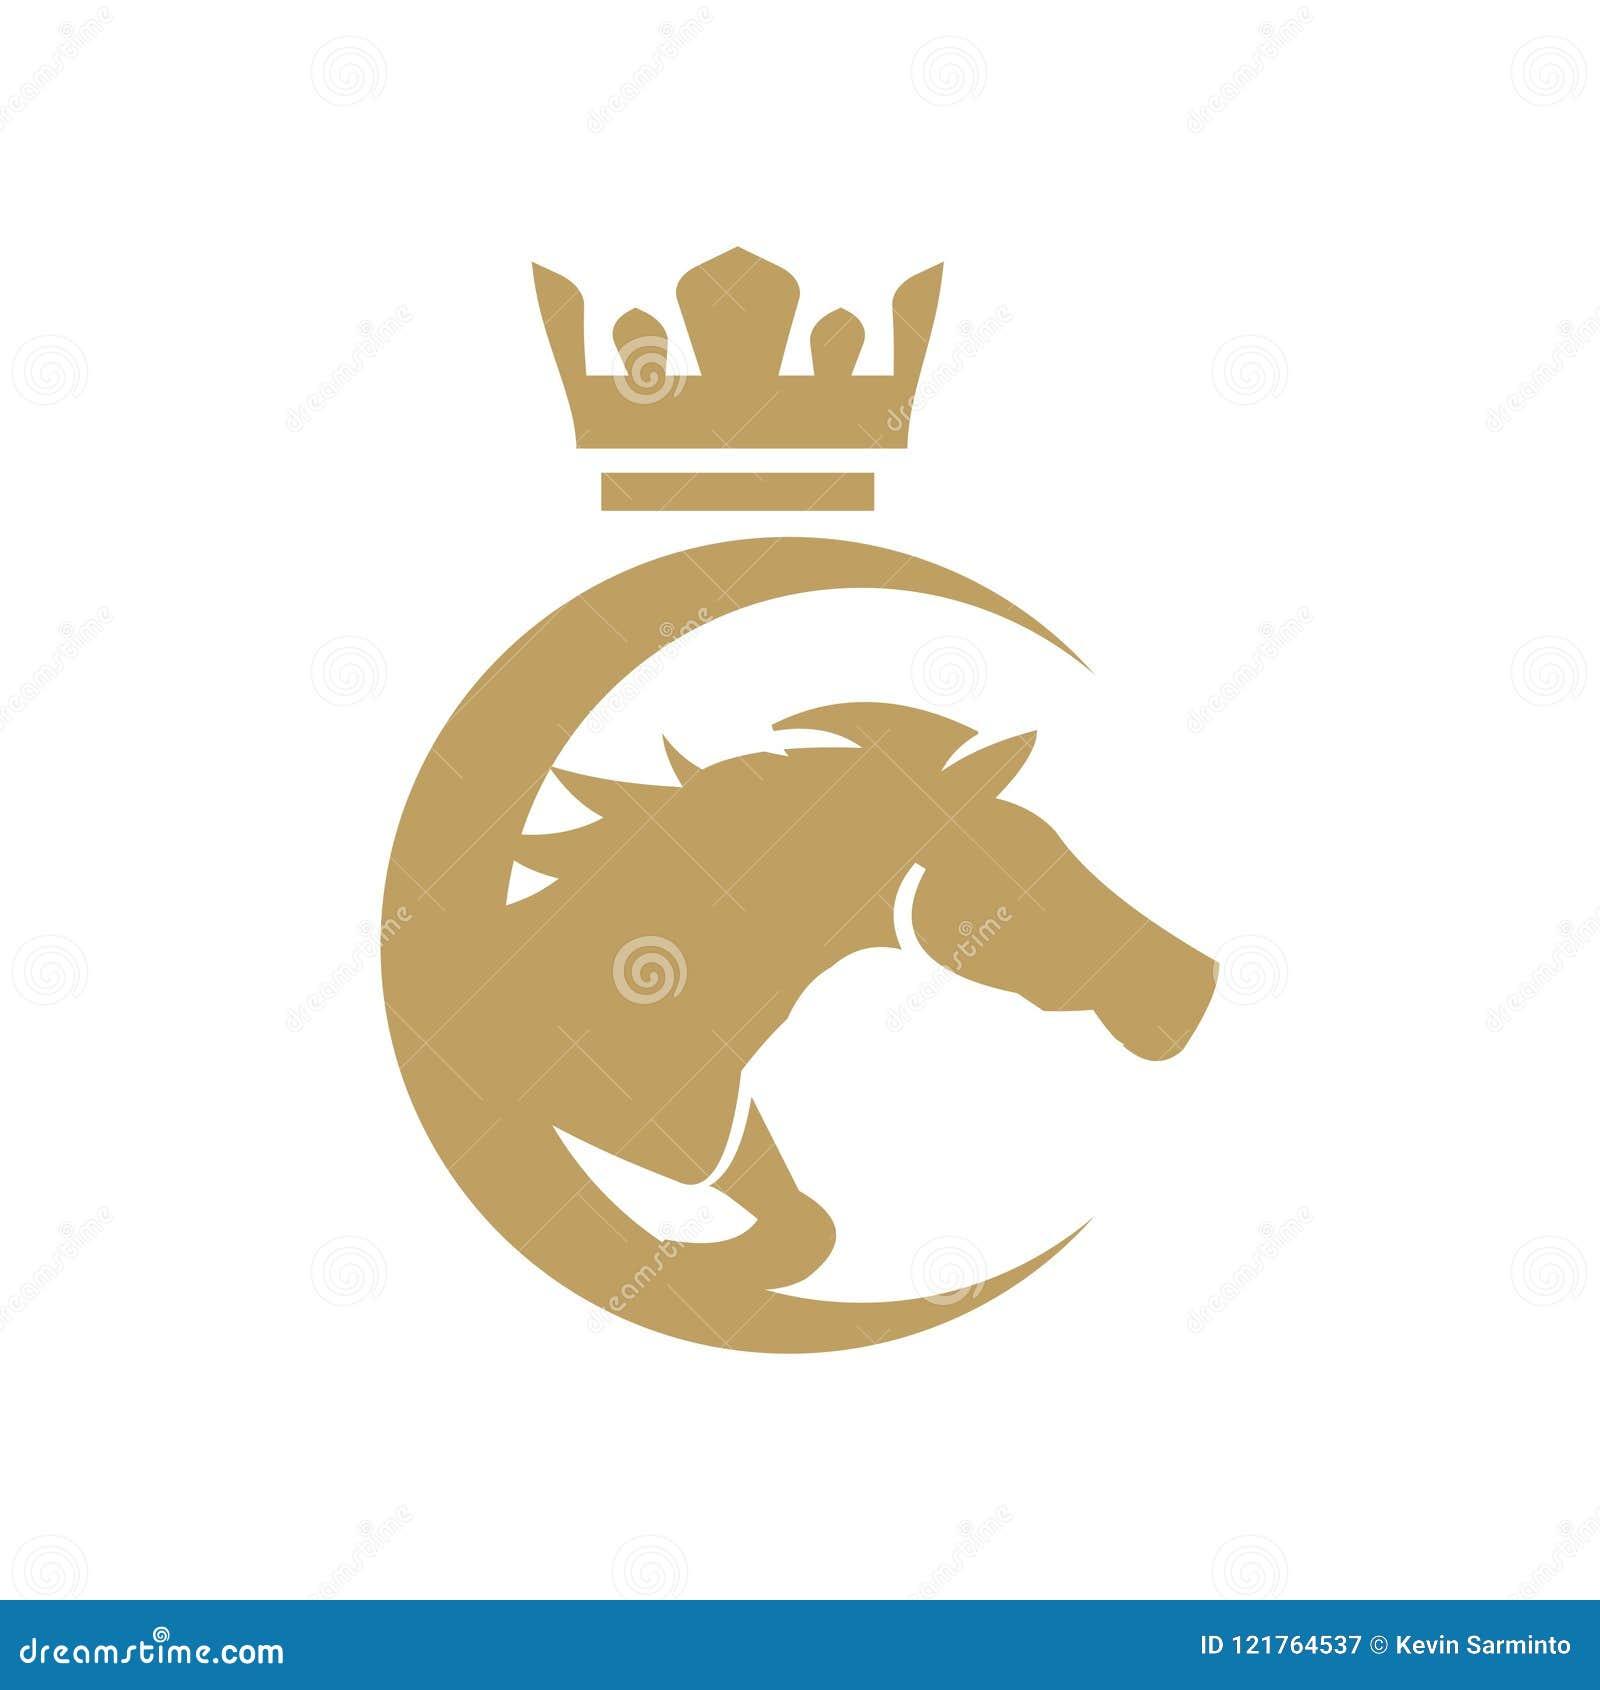 Horse Logo Design Inspiration Stock Vector Illustration Of Drawing Design 121764537